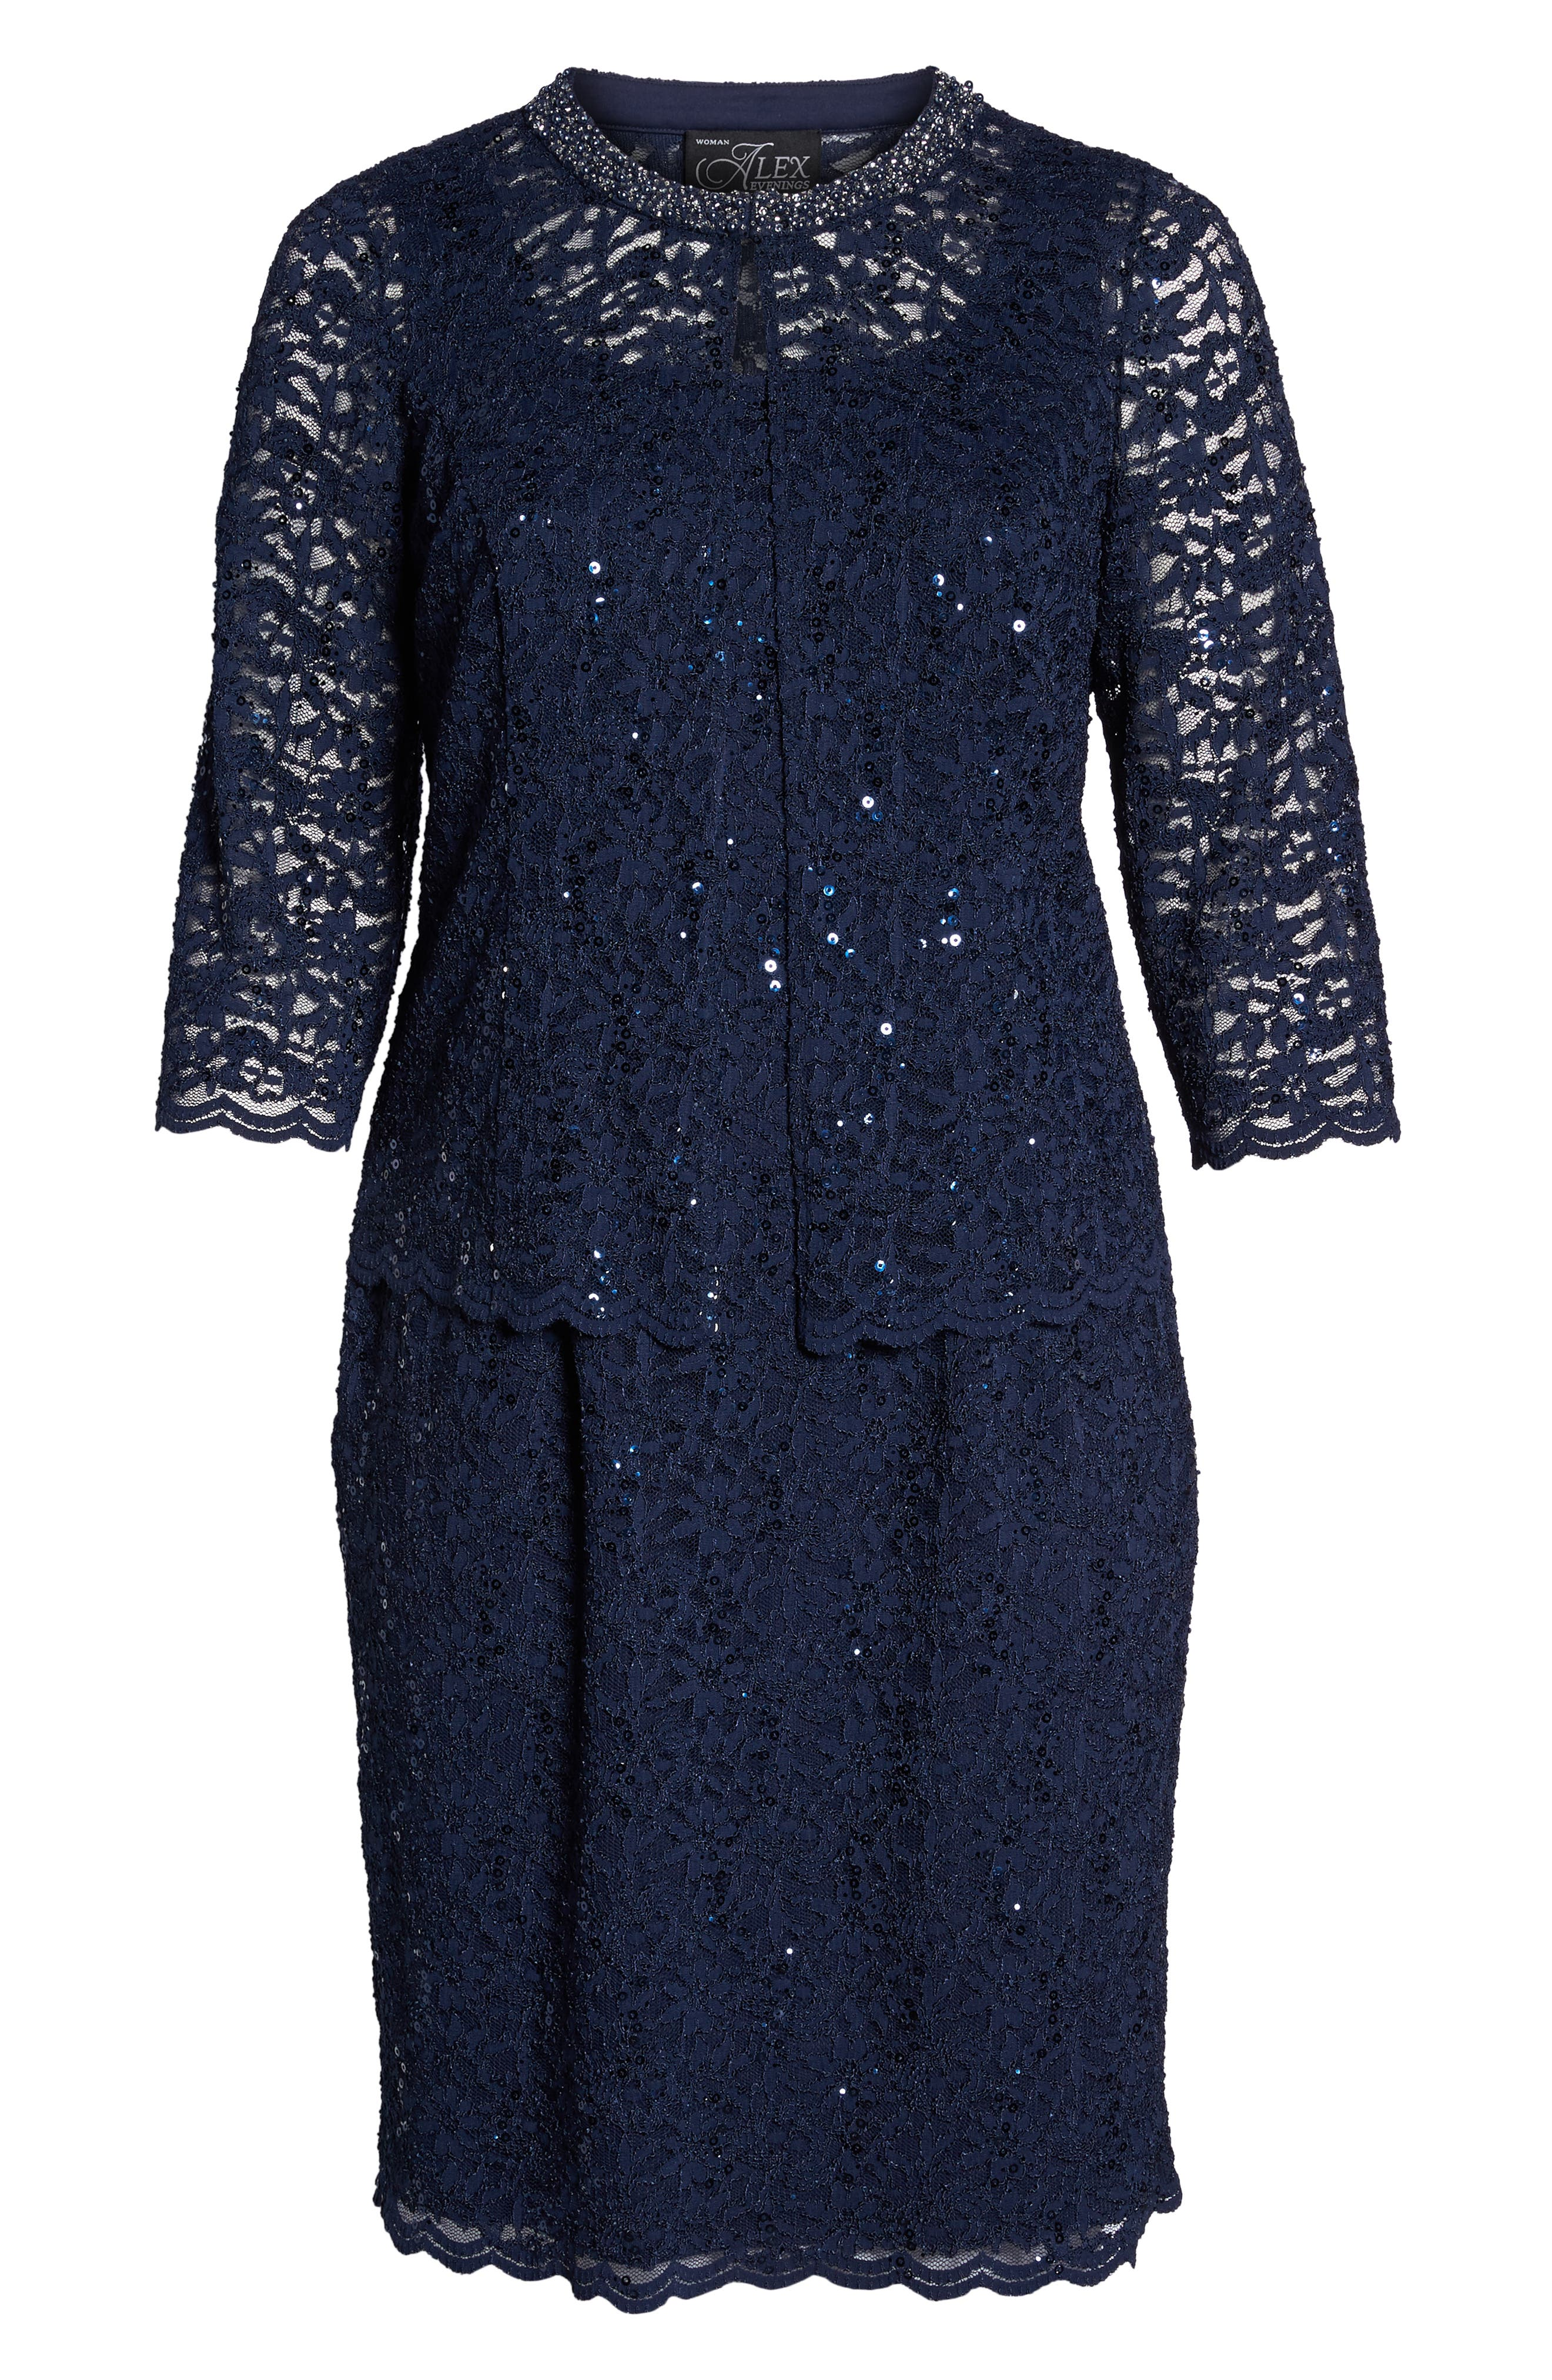 Sequin Shift Dress & Jacket,                             Alternate thumbnail 6, color,                             NAVY